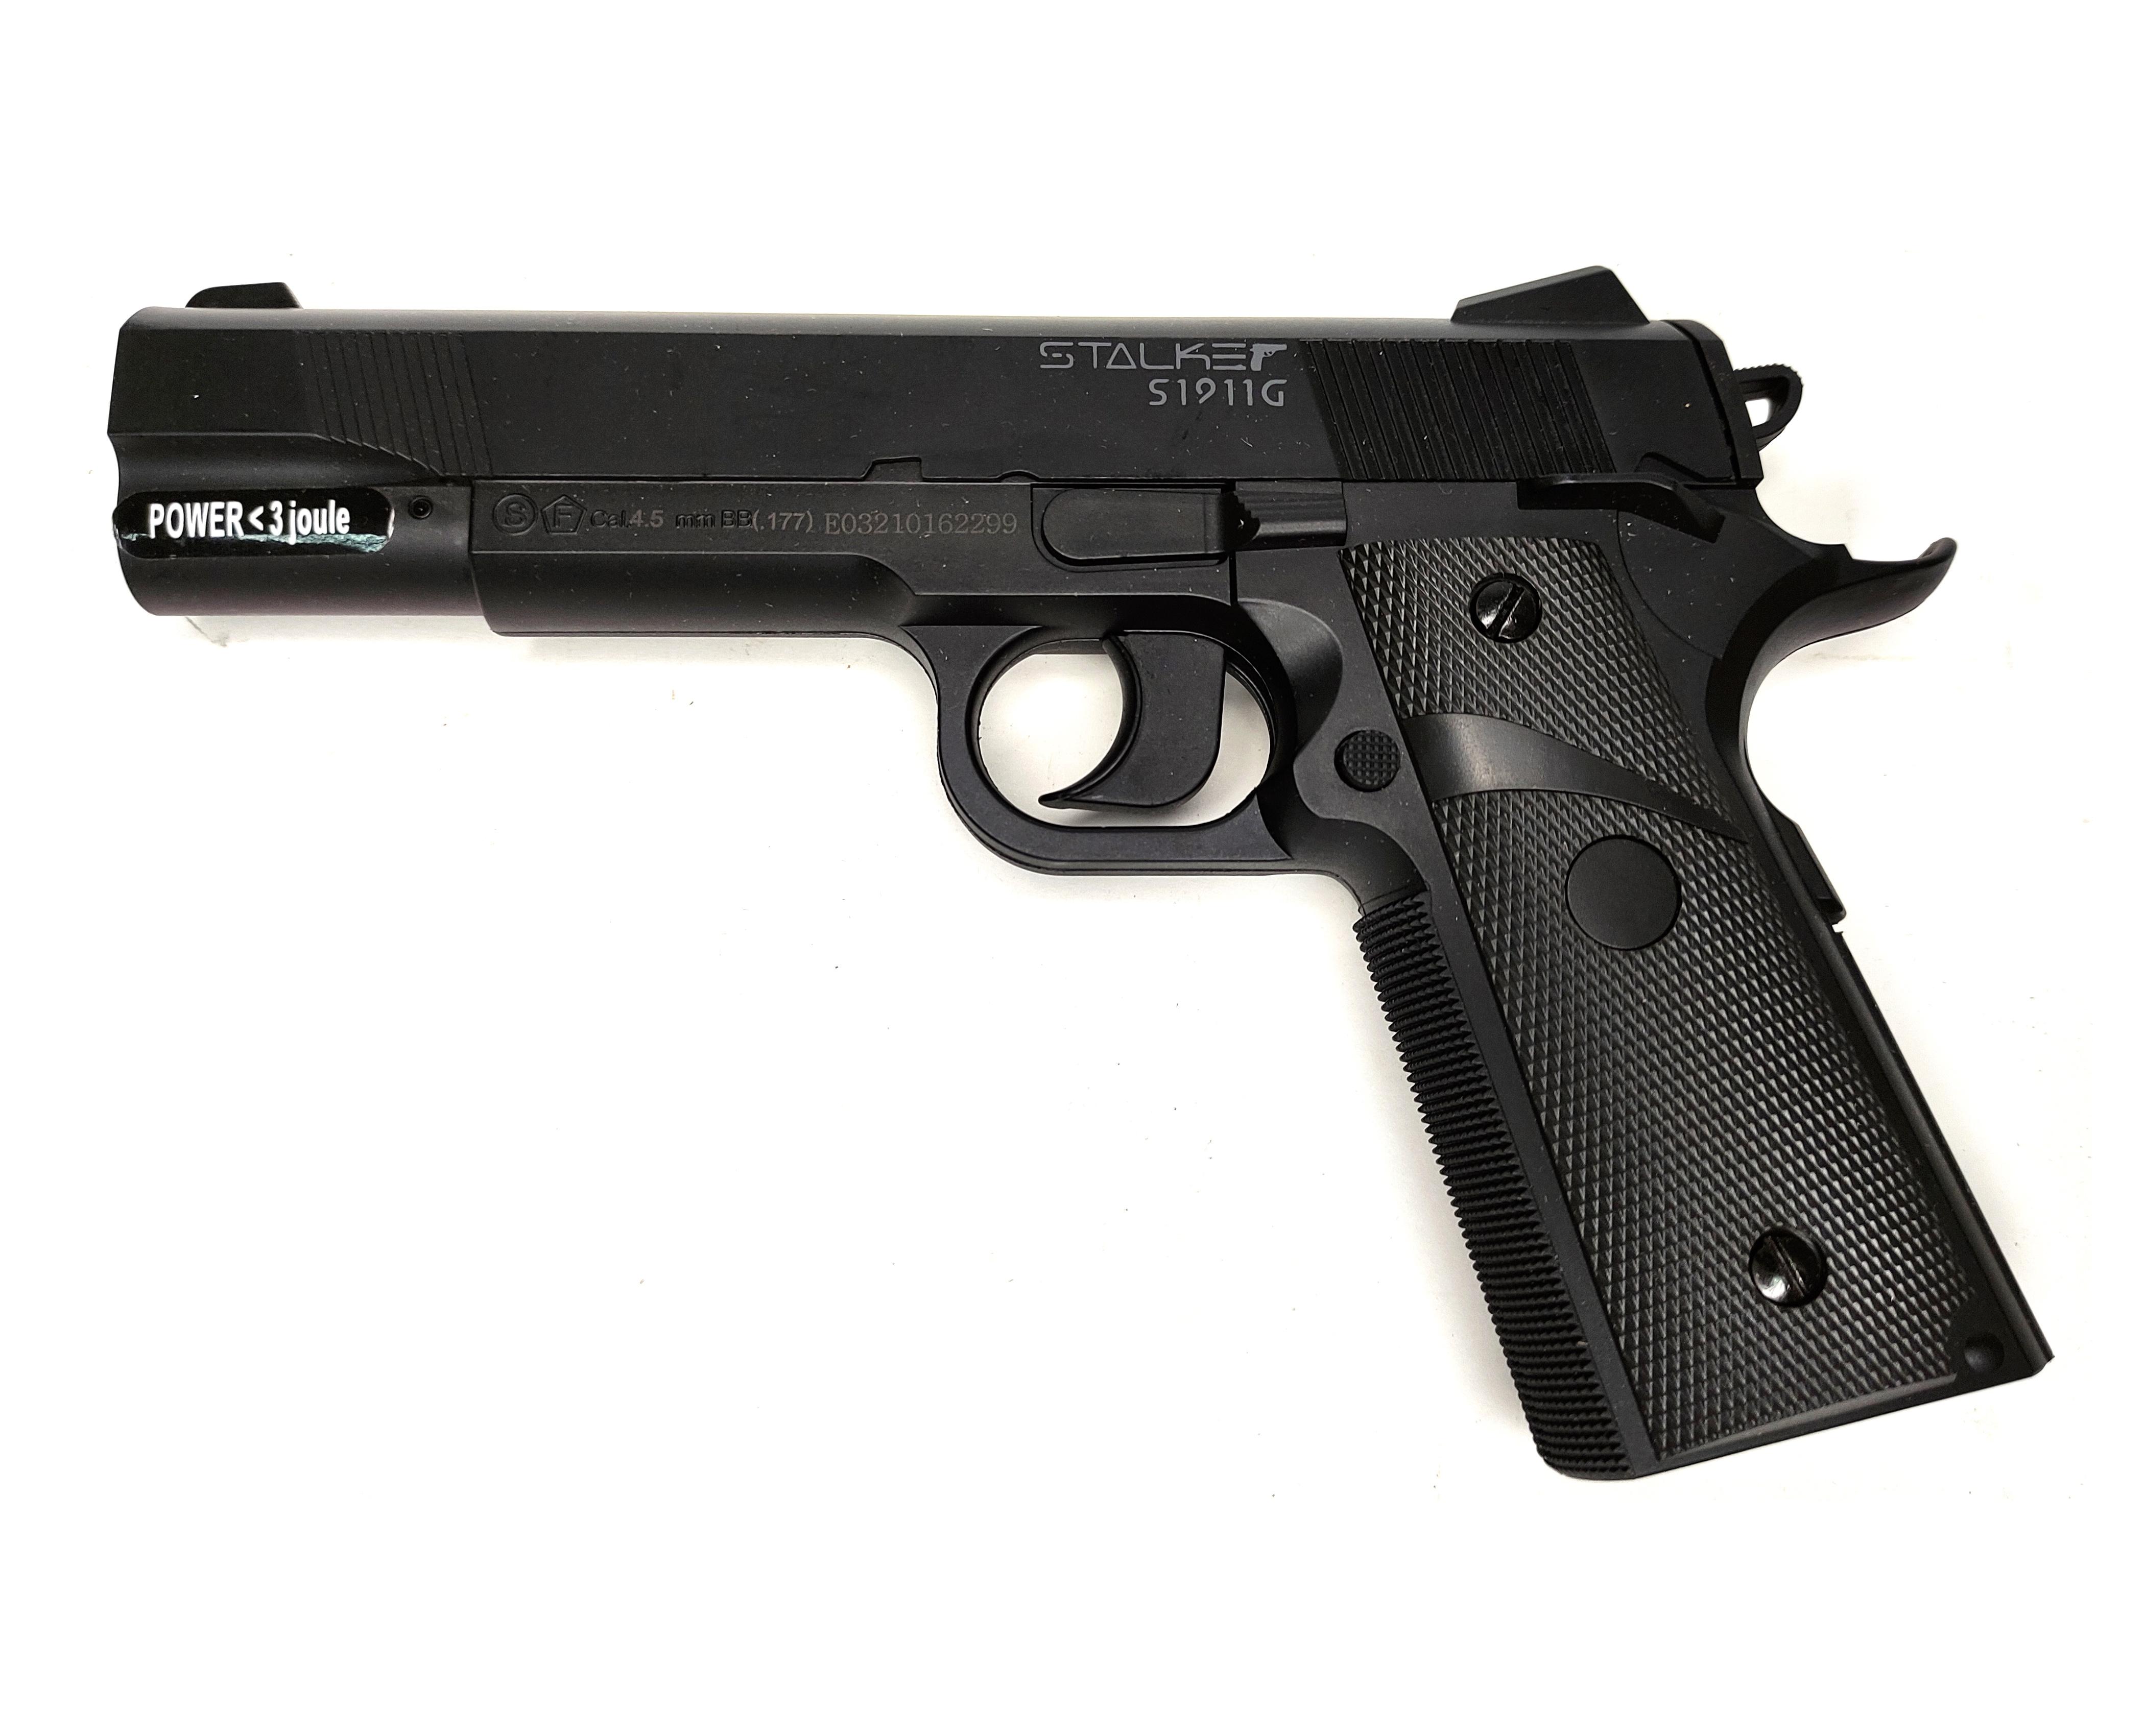 |Уценка| Пневматический пистолет Stalker S1911G, Colt (№ ST-12051G-179-уц)